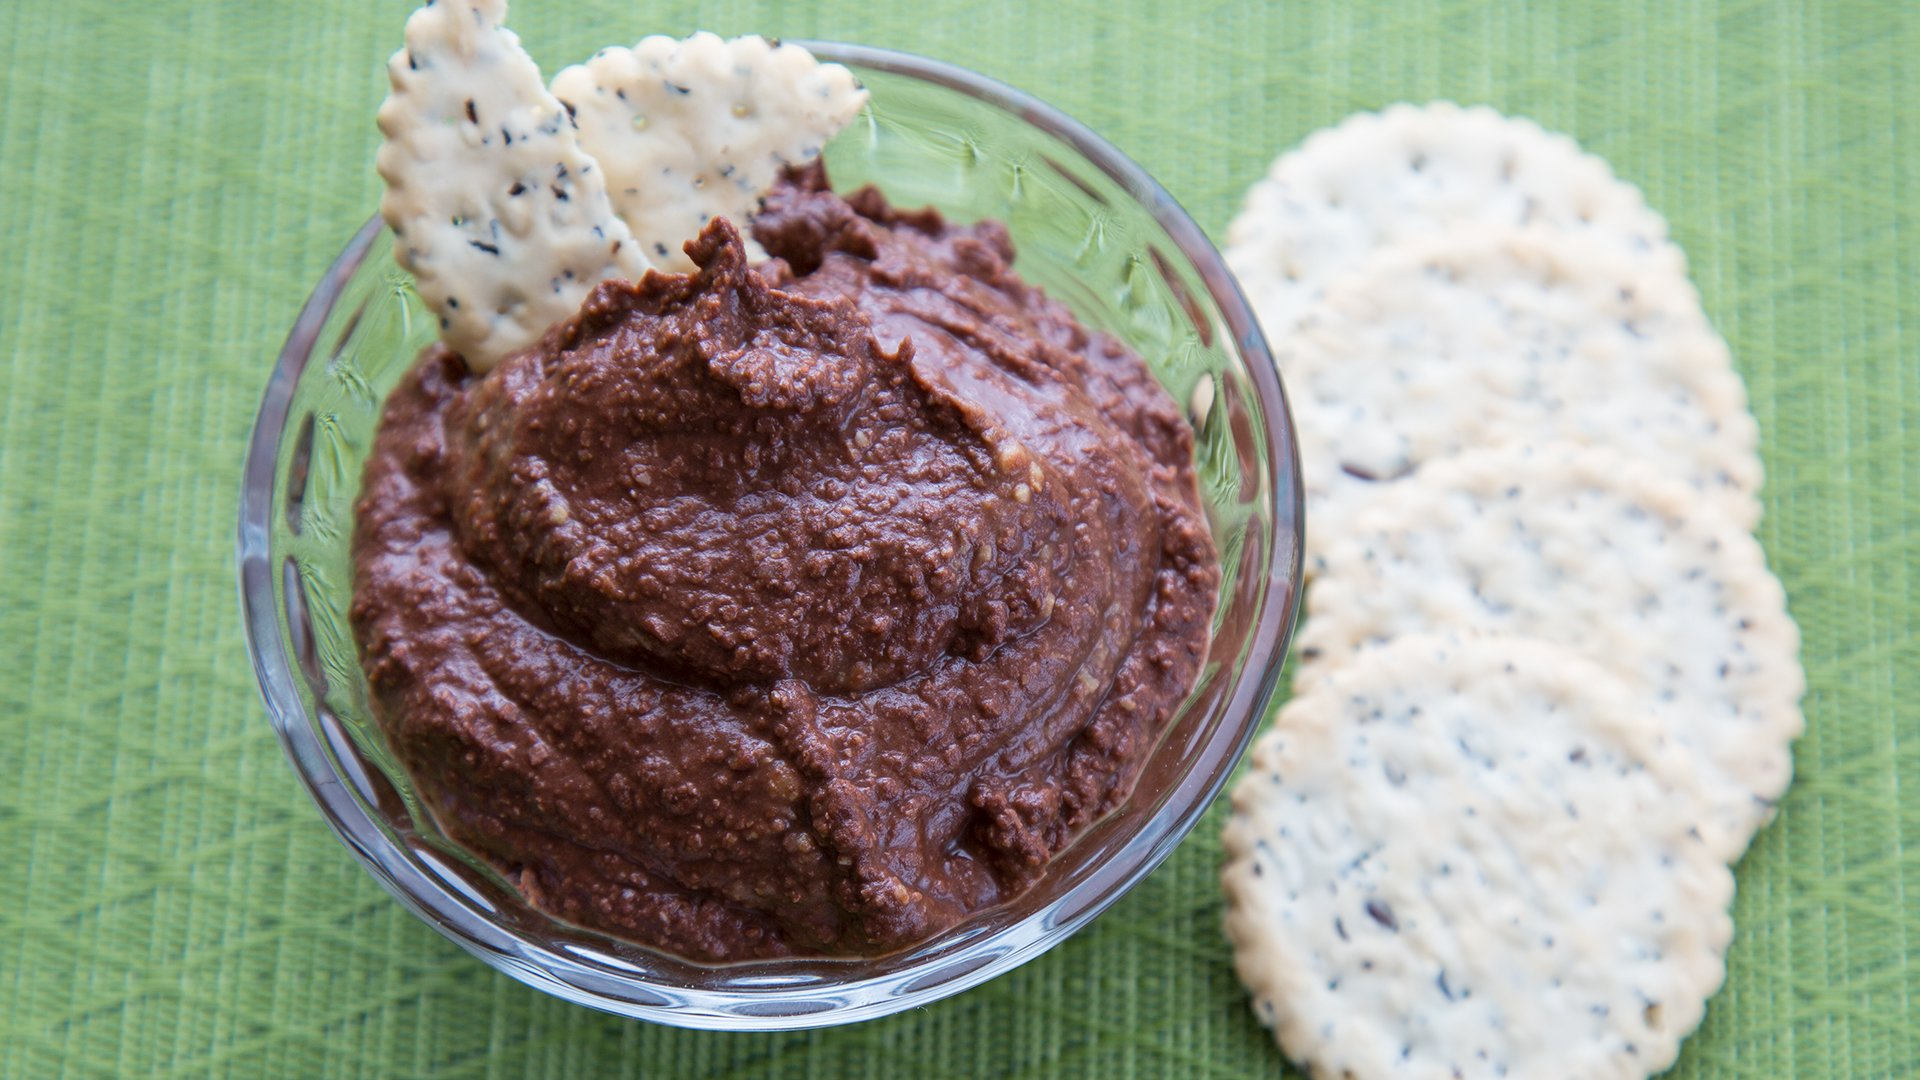 Chocolate Peanut Butter Hummus